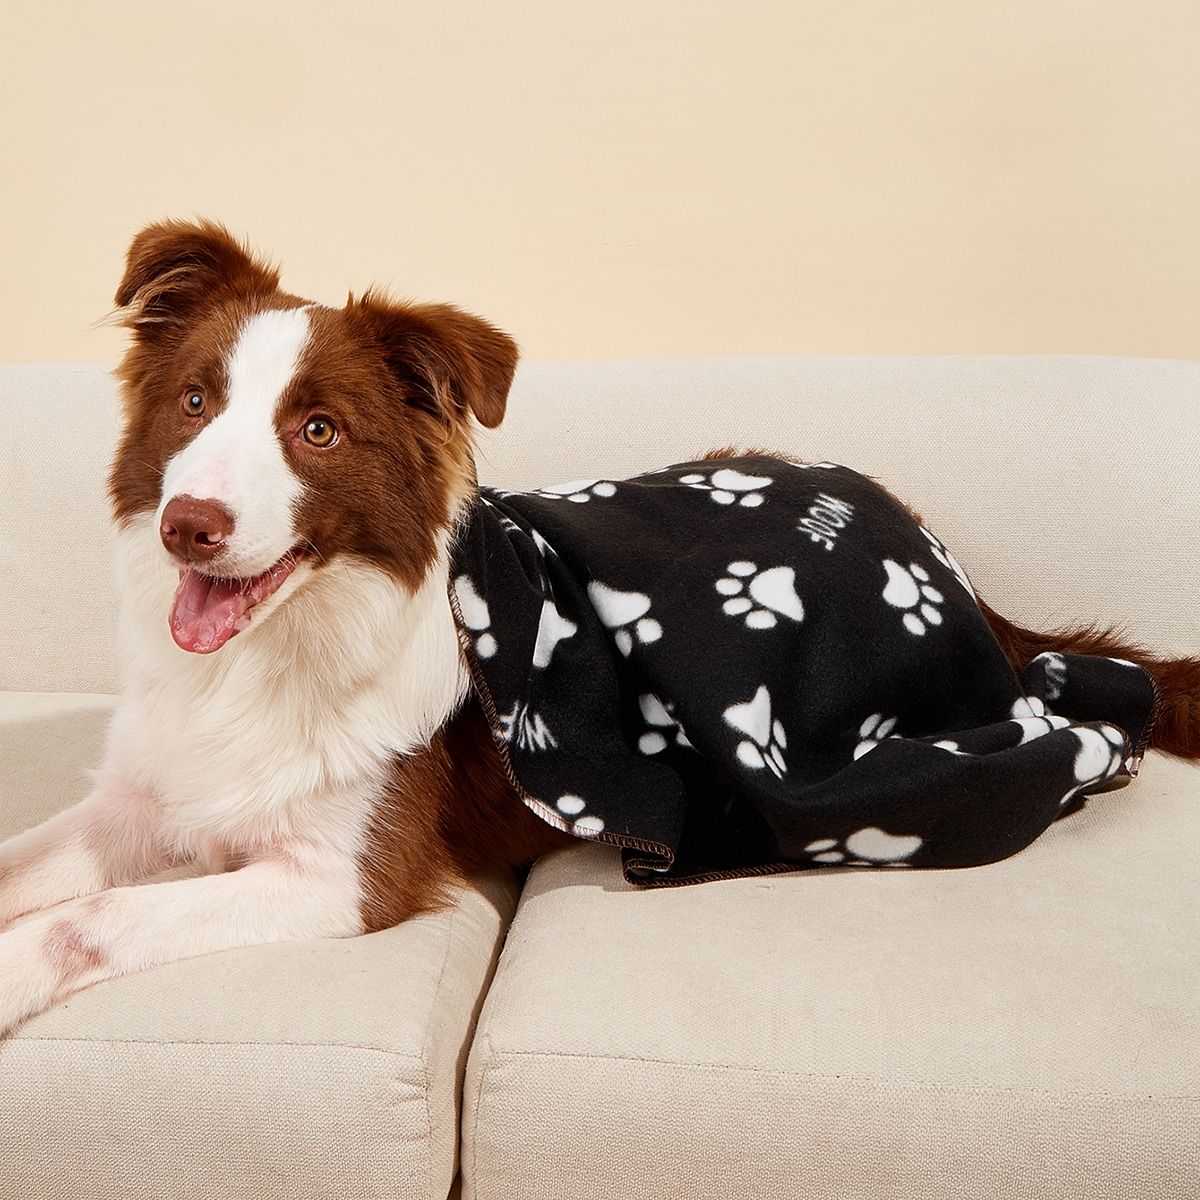 Haustier Decke mit Klaue Muster